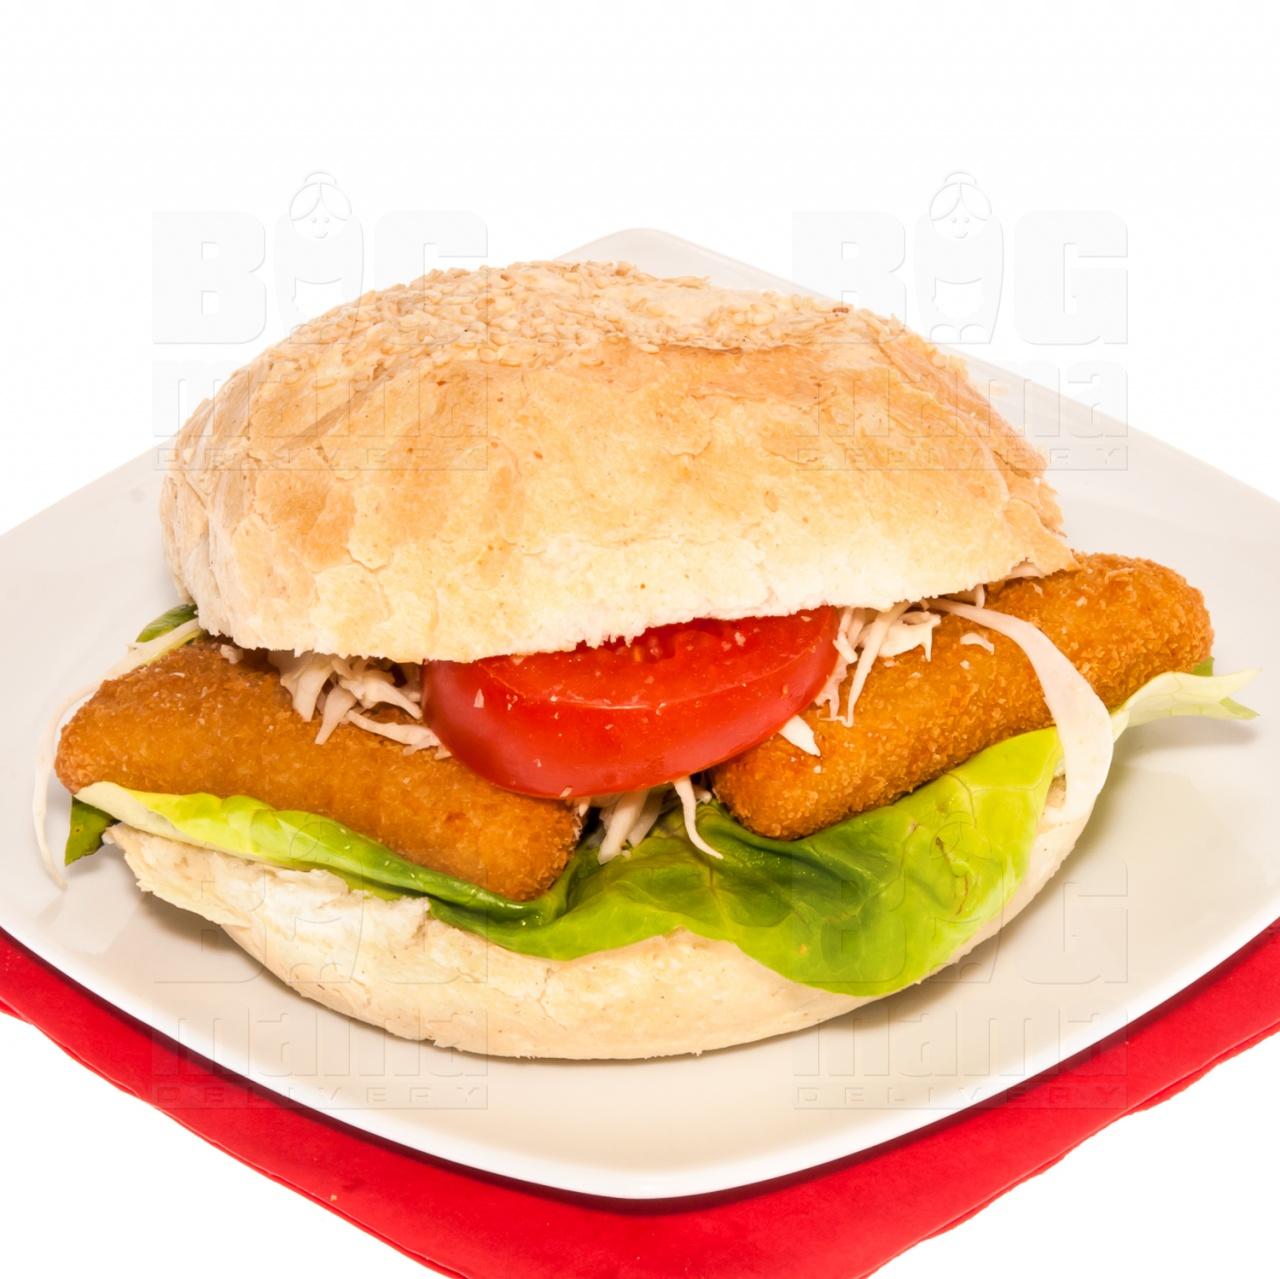 Product #145 image - Sandviș mic cu cașcaval pane